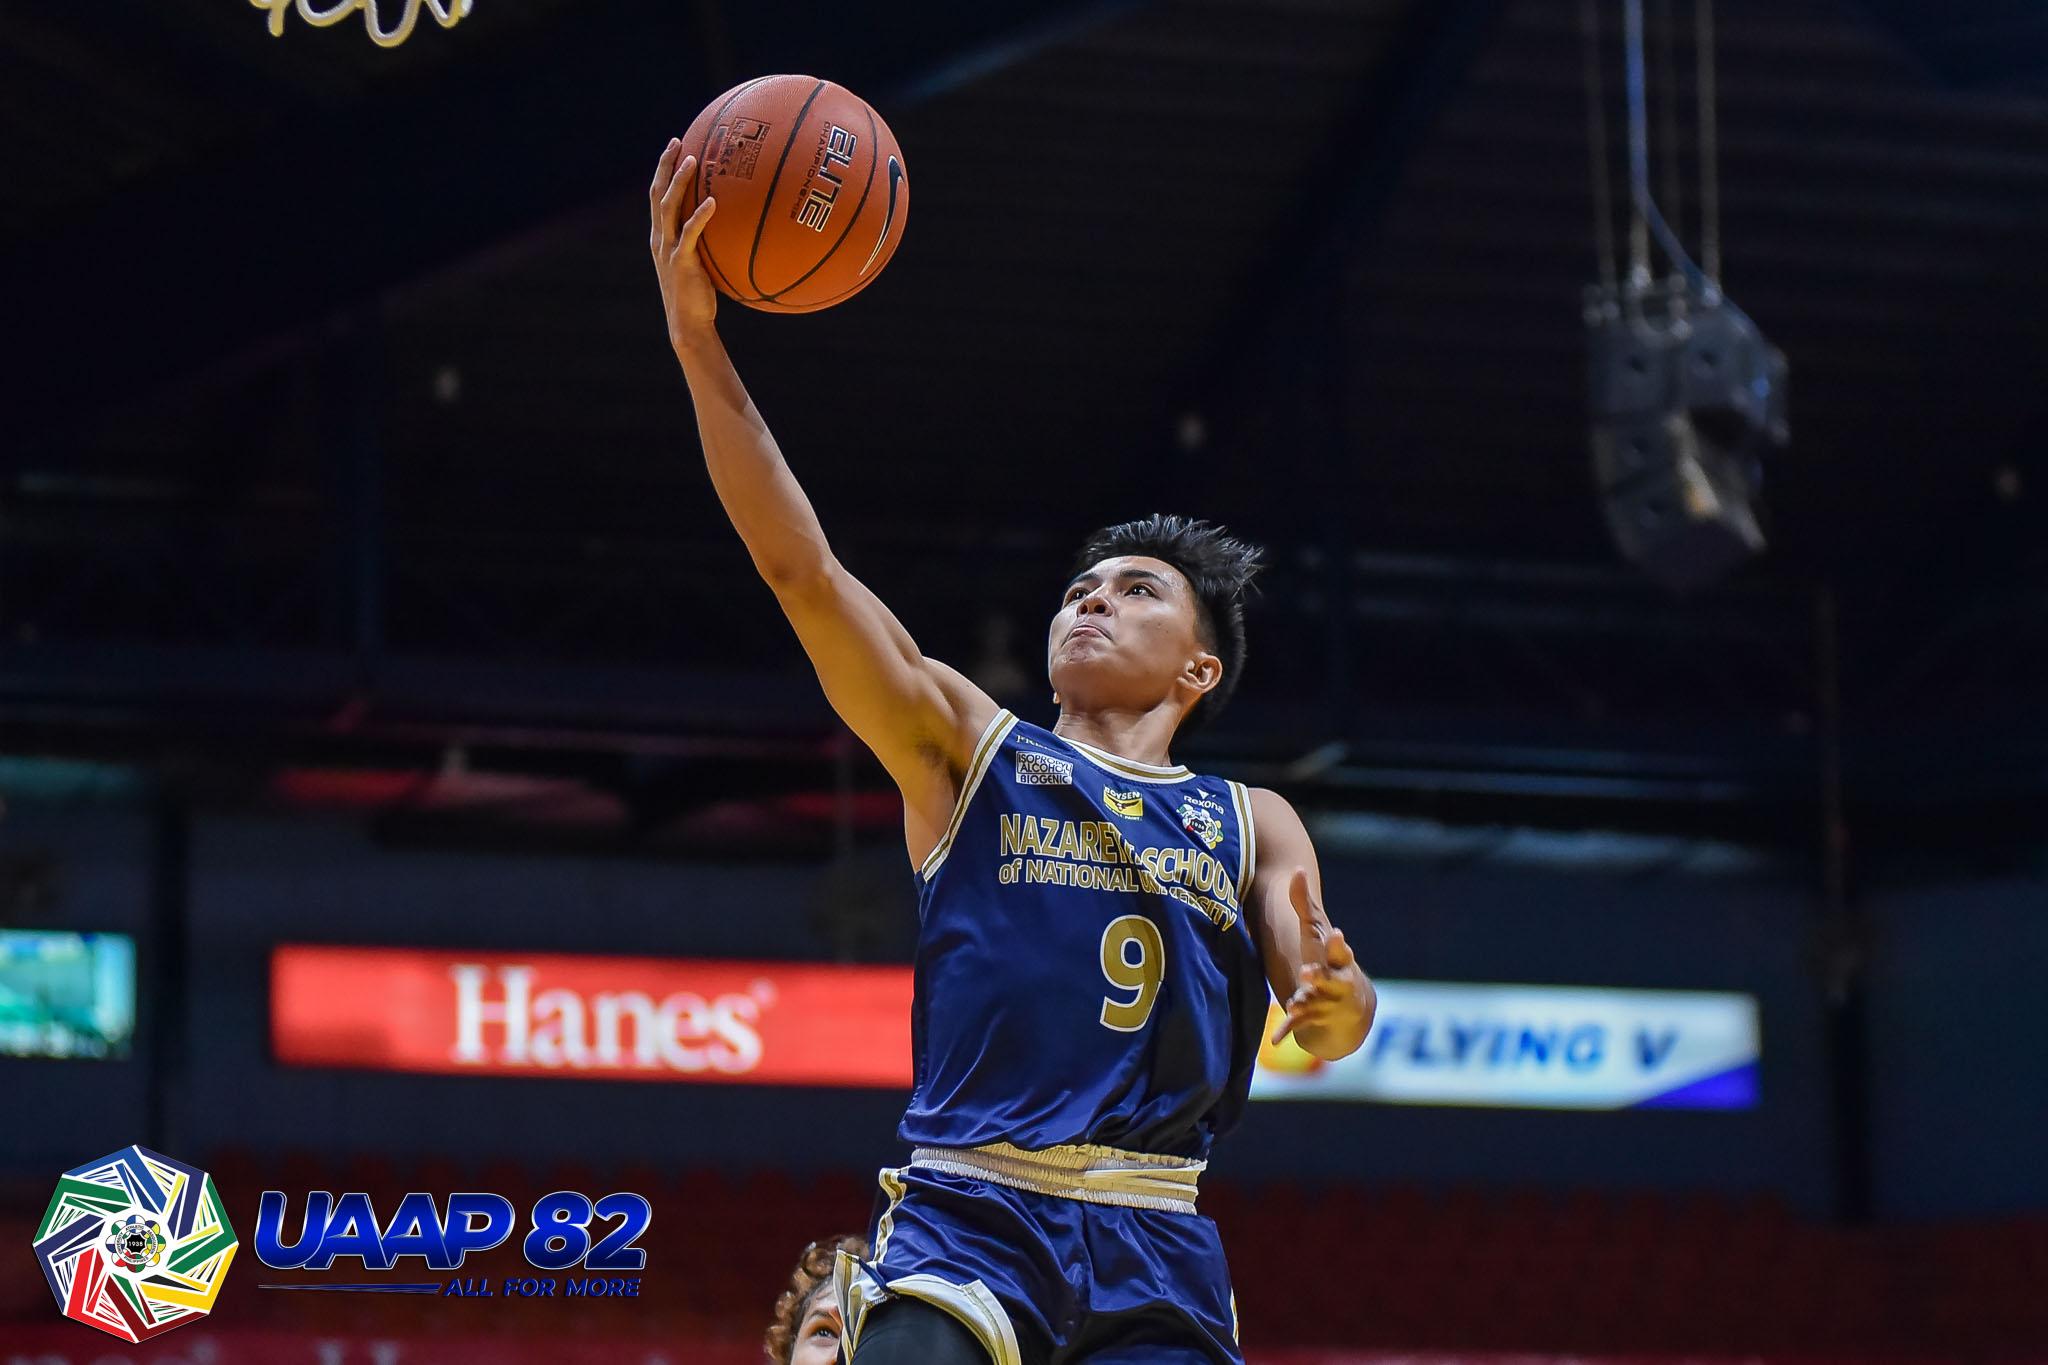 UAAP-82-Highschool-Basketball-NU-vs.-UPIS-Alarcon-9899 Harold Alarcon joins Tamayo, Abadiano, Fortea in UP Basketball News NU UAAP UP  - philippine sports news